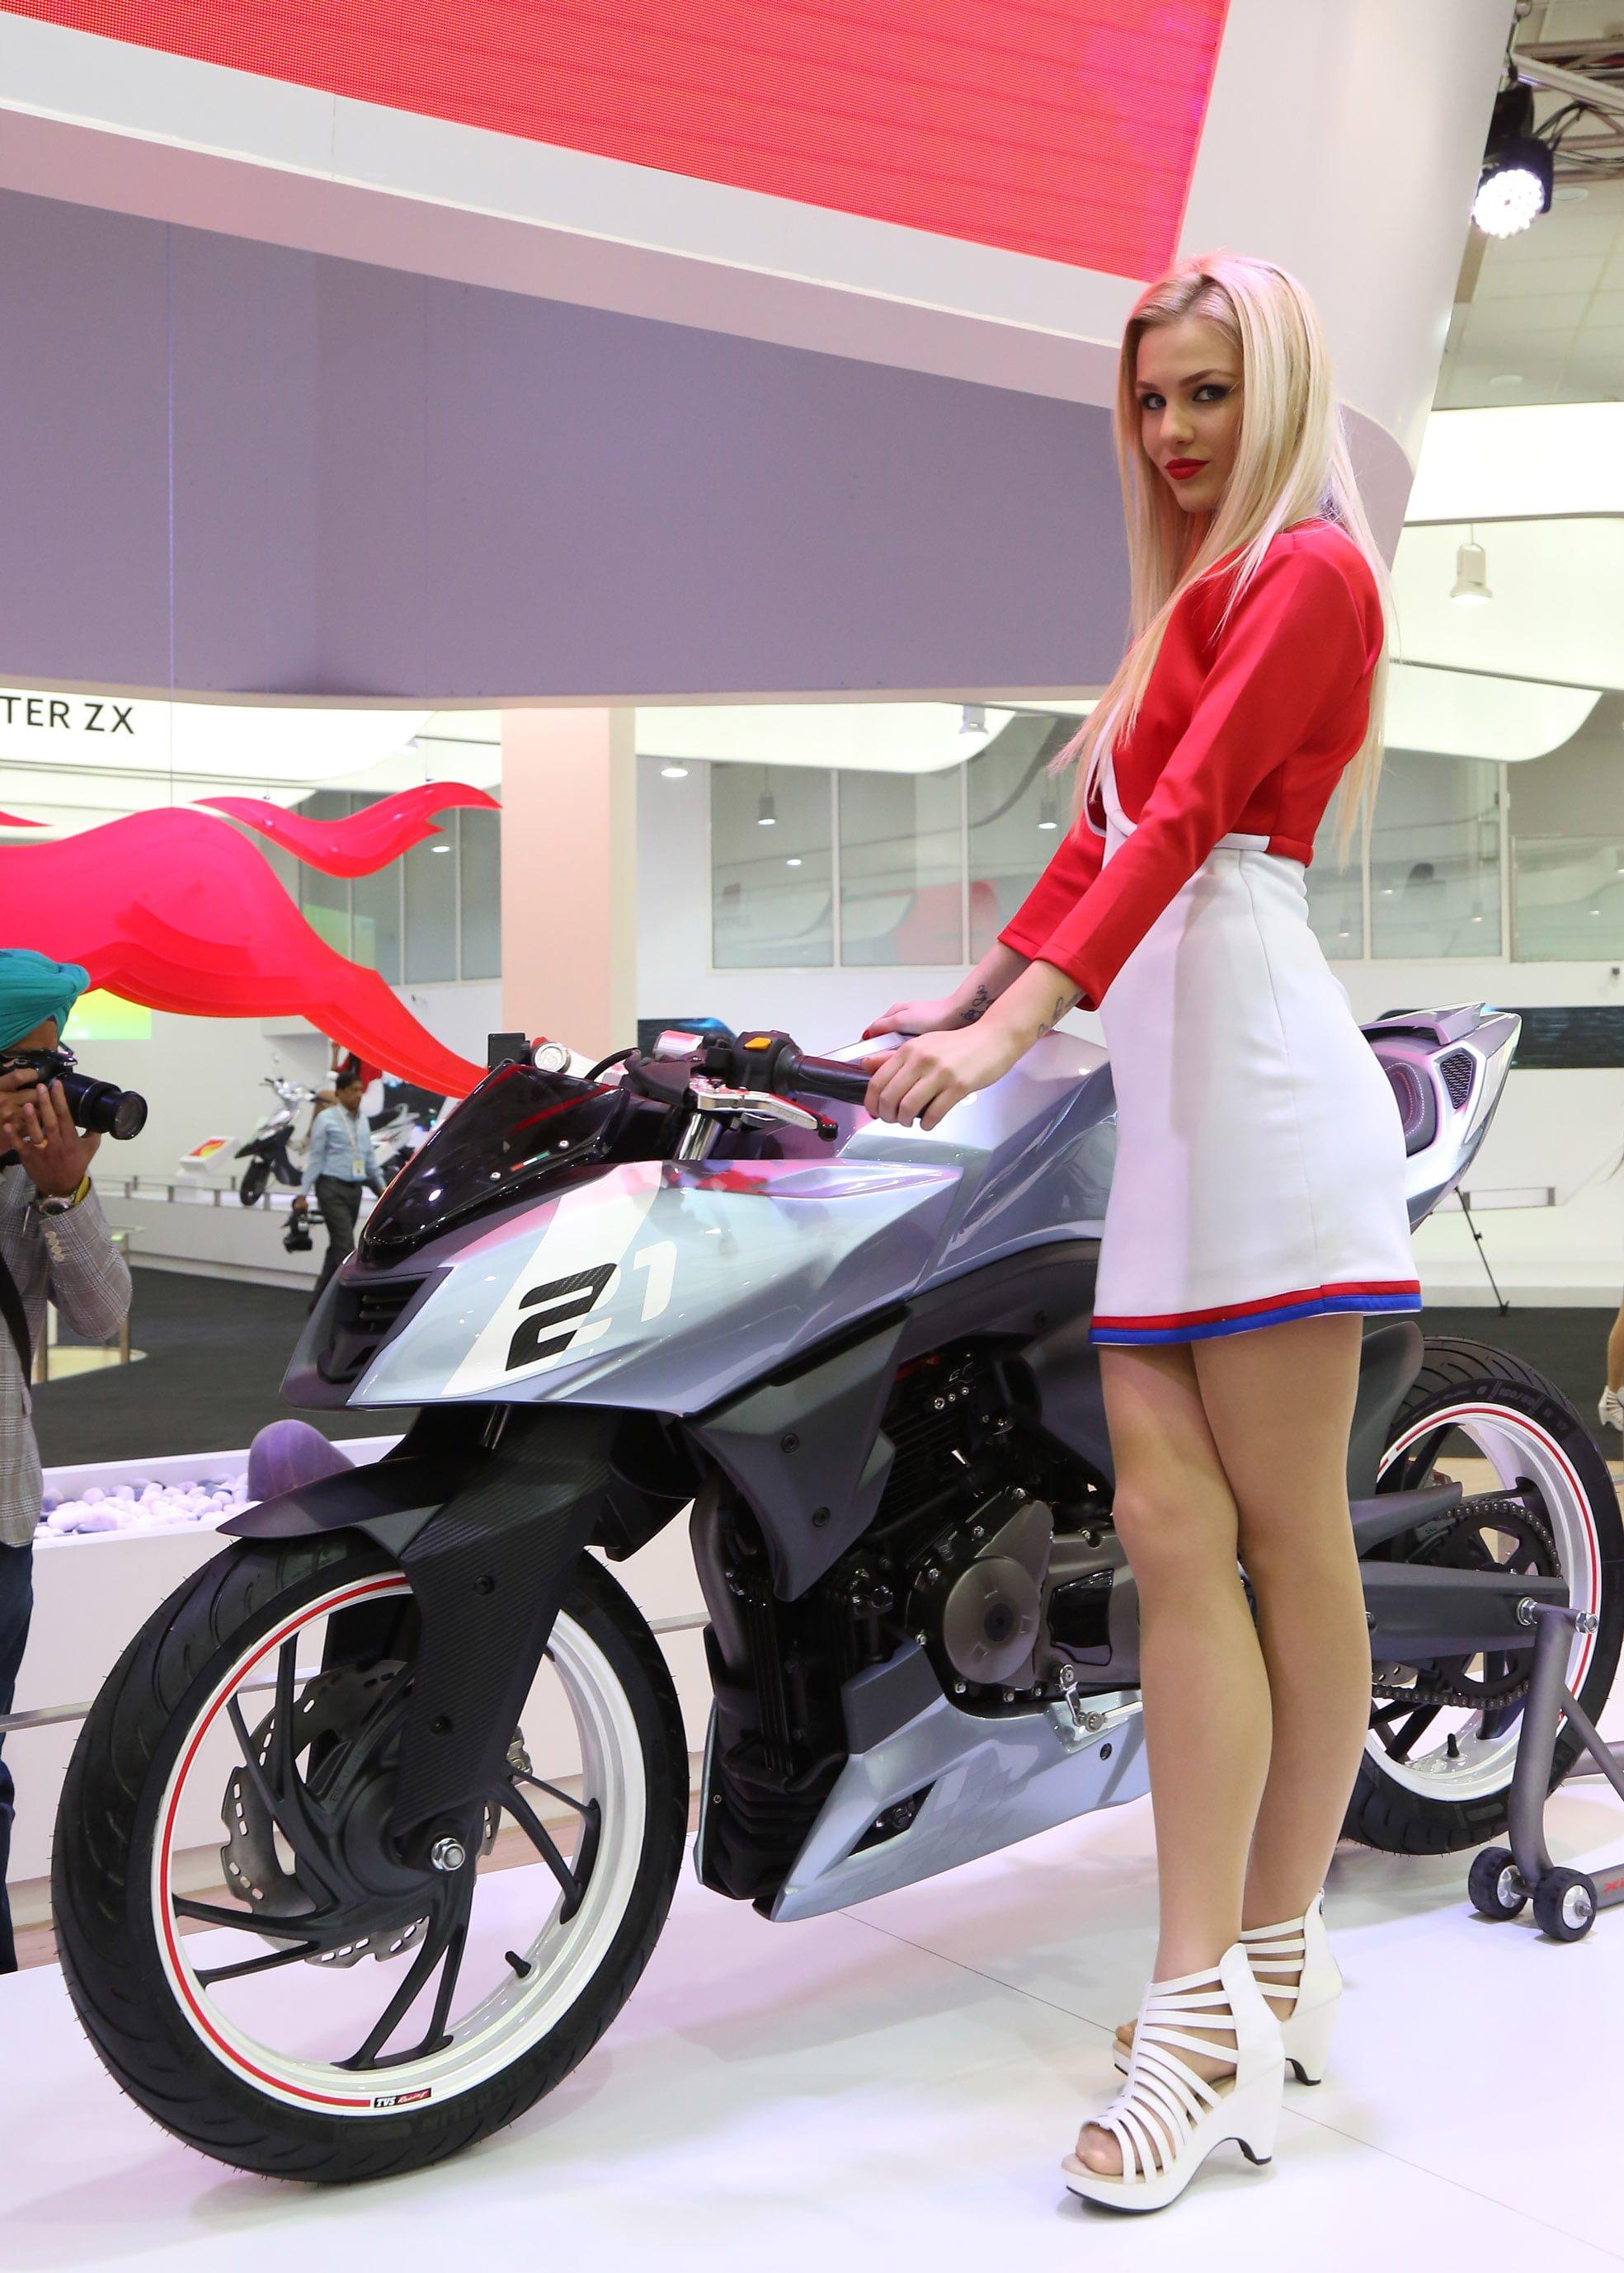 tvs motor company unveiled tvs x21 at auto expo carblogindia. Black Bedroom Furniture Sets. Home Design Ideas